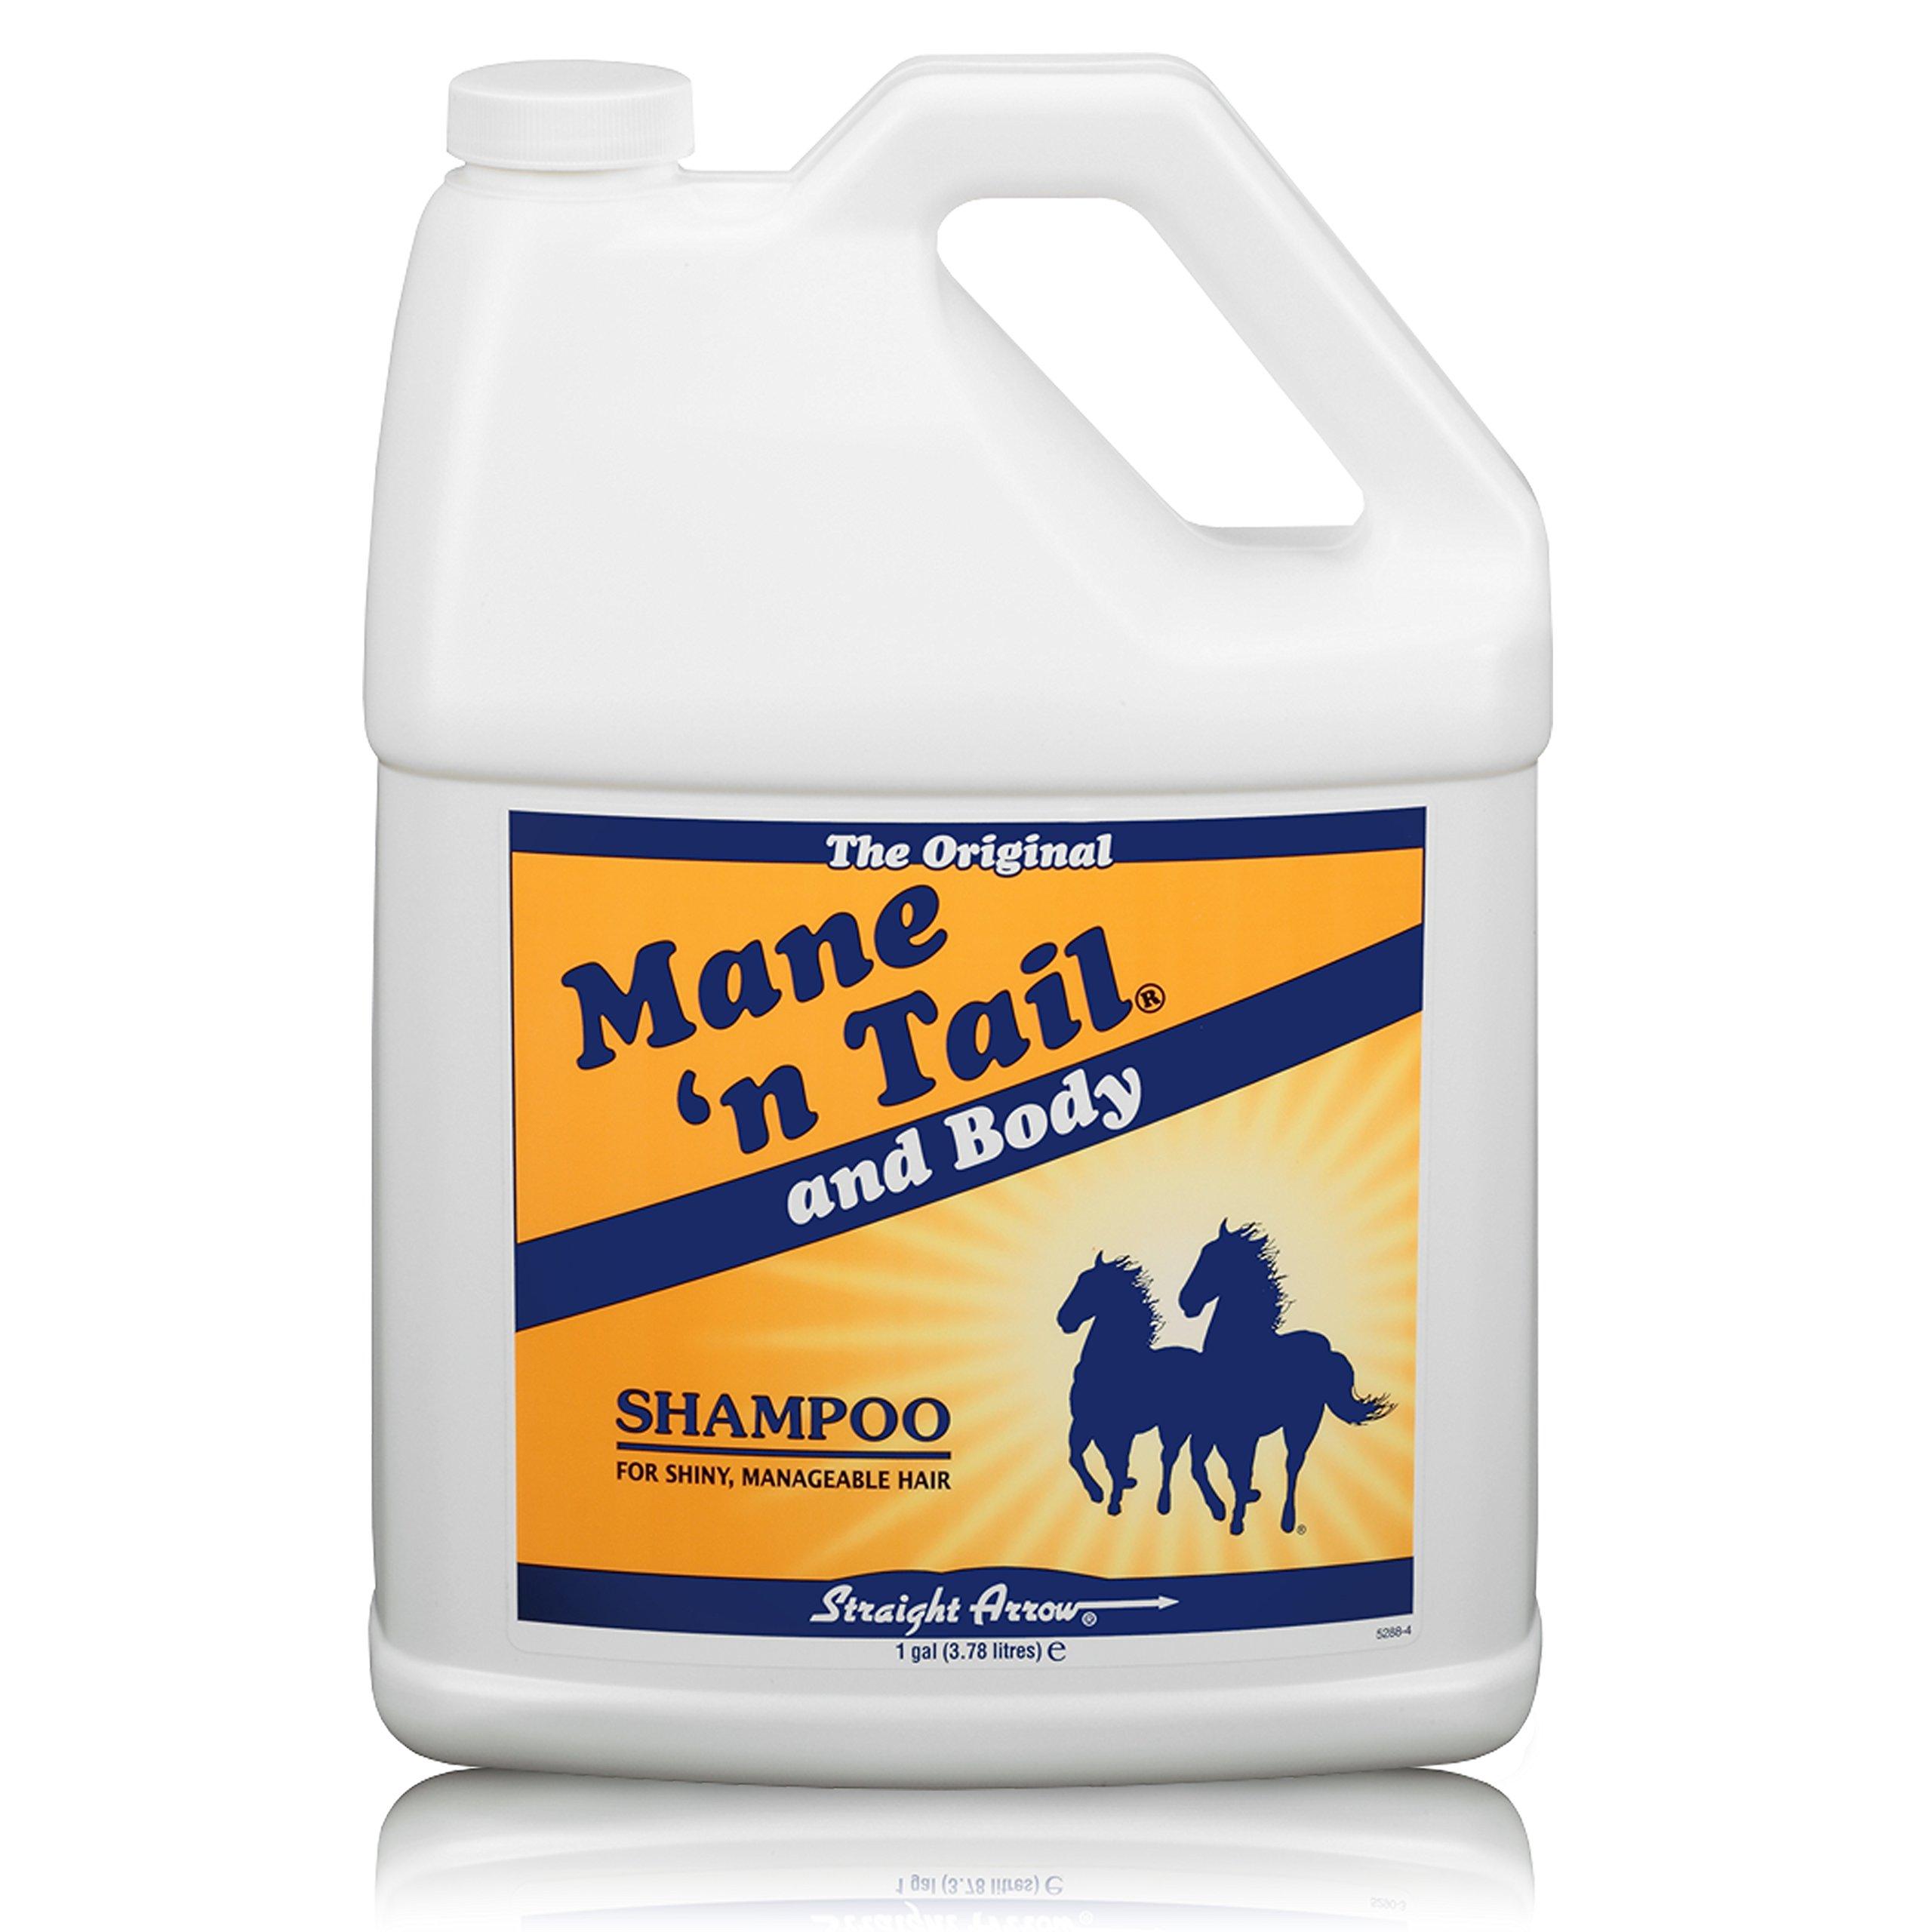 Mane 'n Tail and Body Shampoo 1 Gallon by Mane 'n Tail